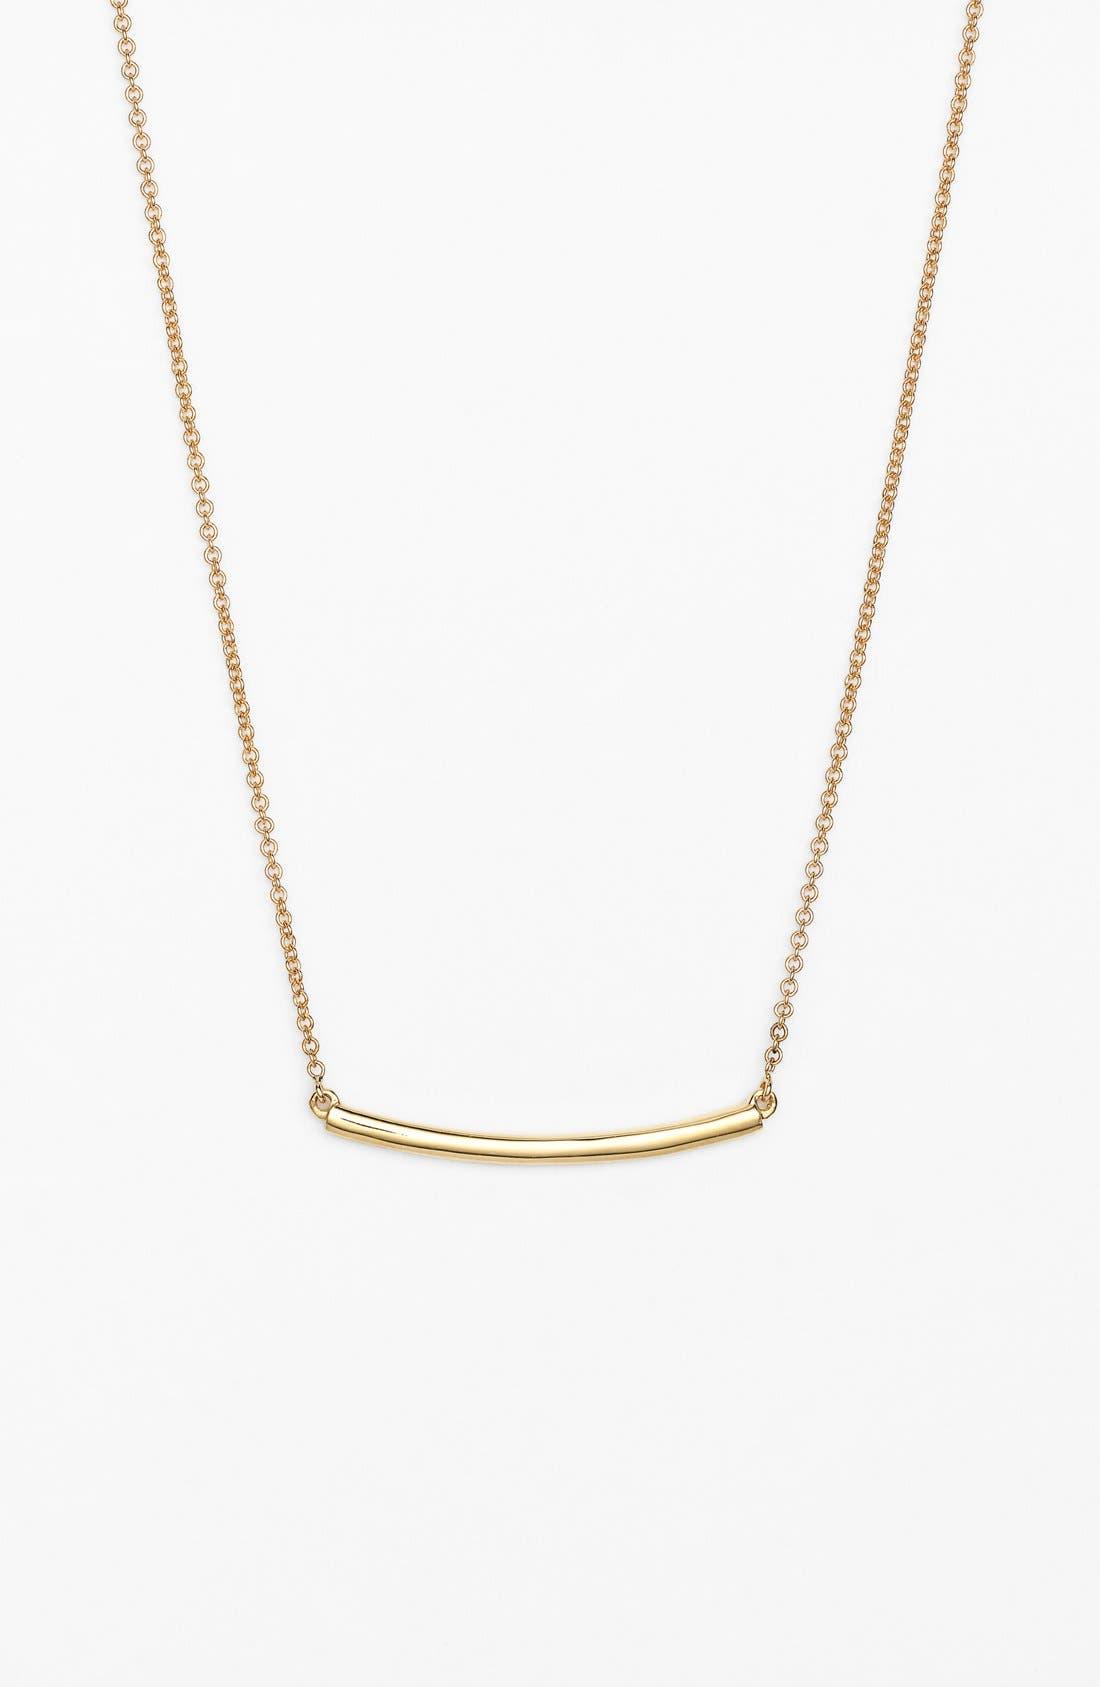 Bar Pendant Necklace,                             Main thumbnail 1, color,                             YELLOW GOLD